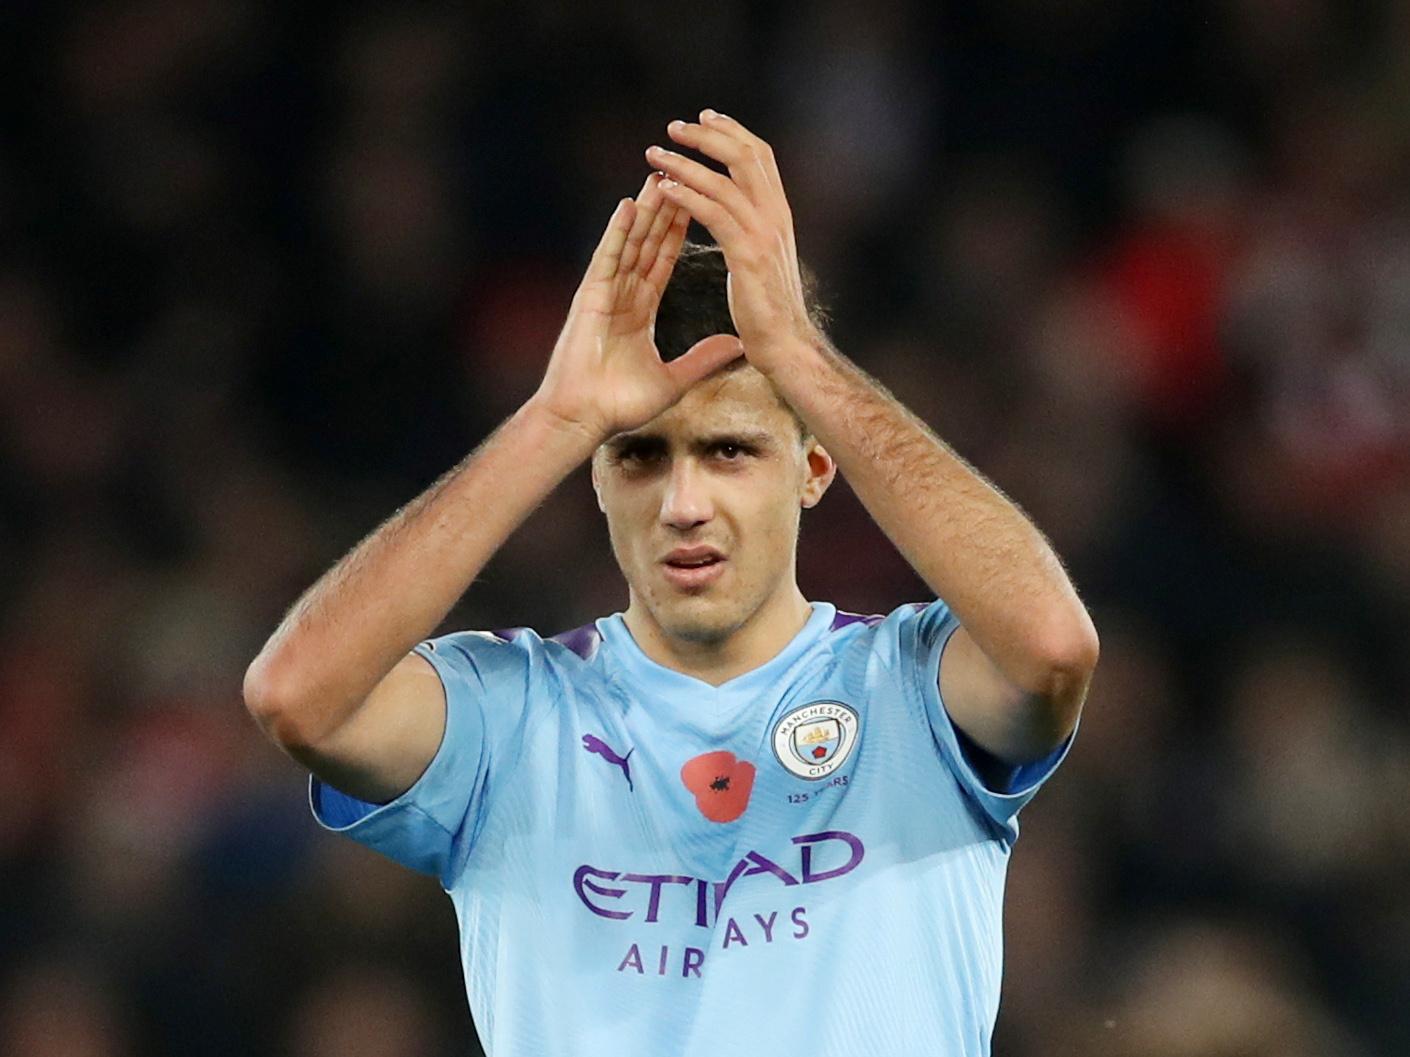 Top Five tallest Manchester City players - Rodri